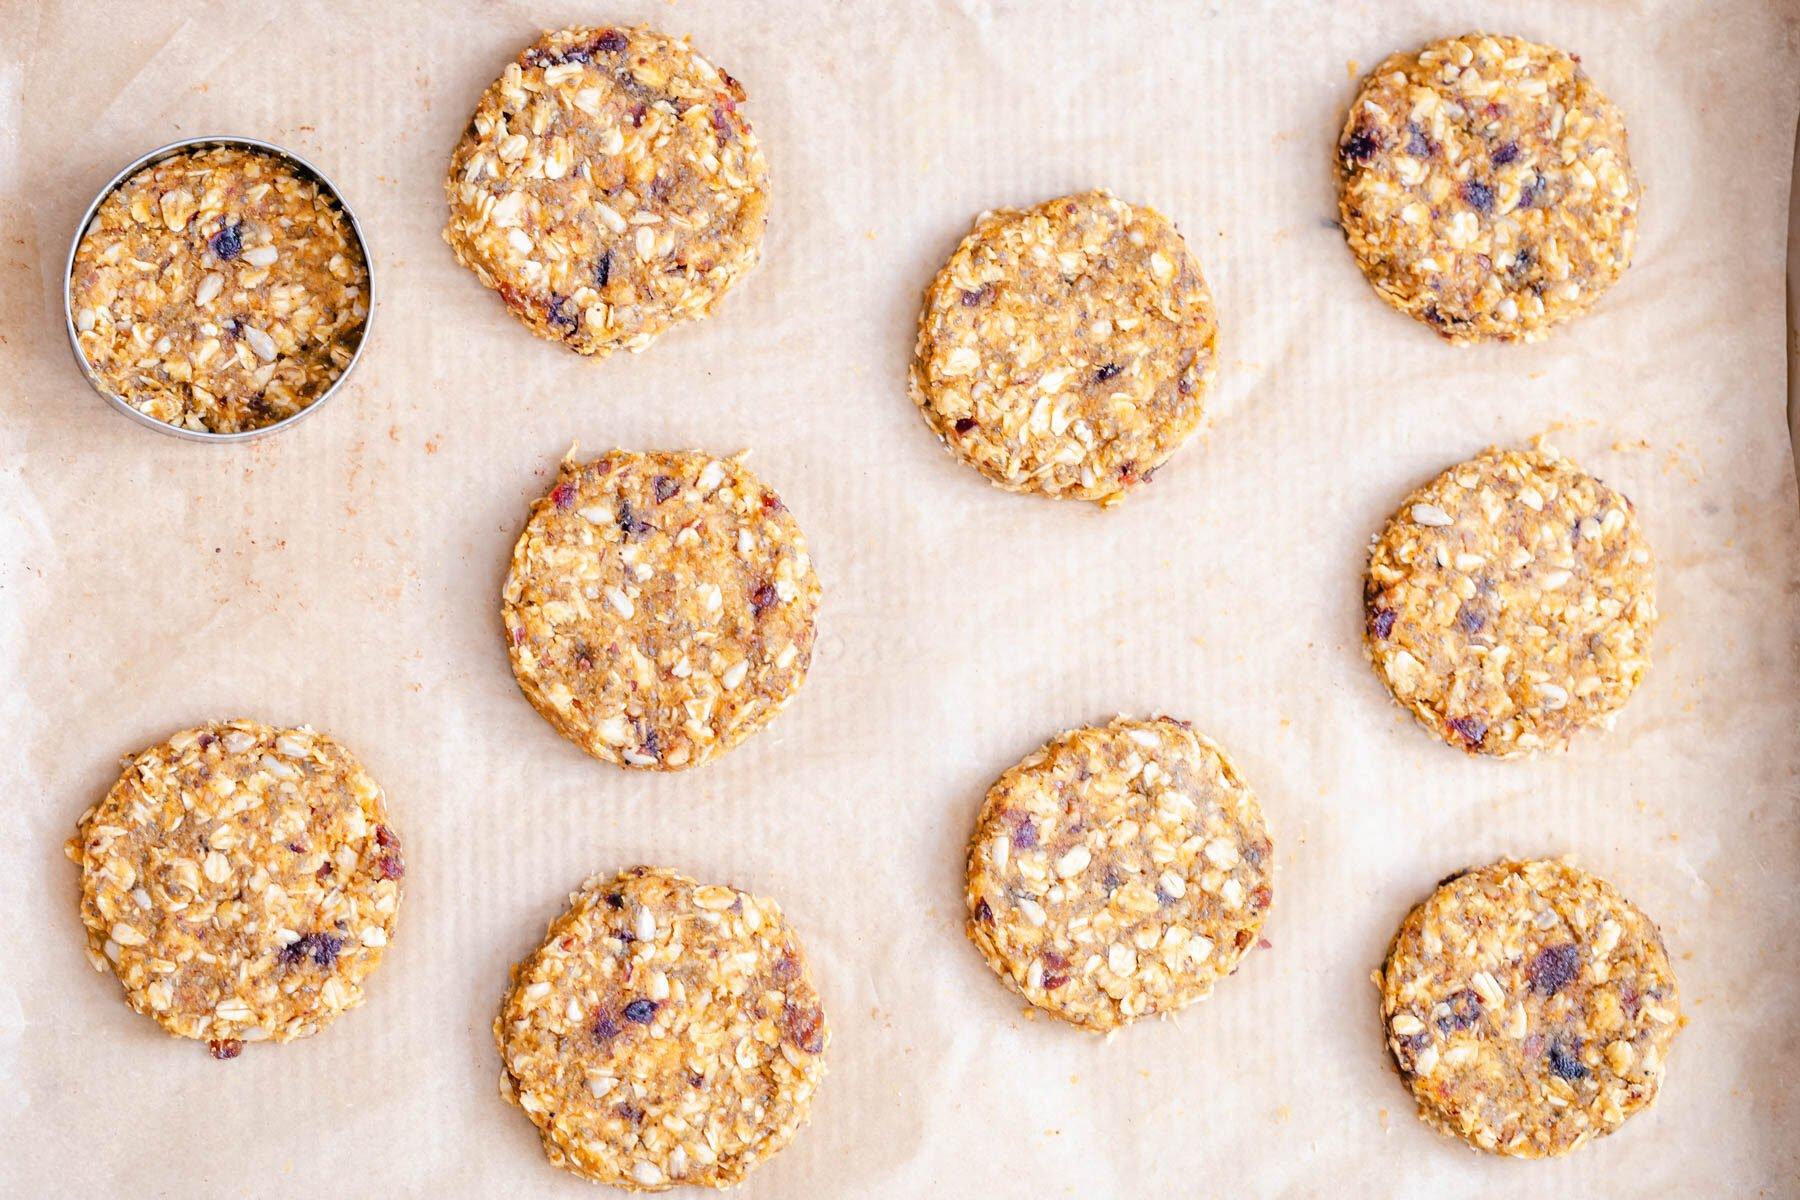 unbaked pumpkin breakfast cookies on a cookie sheet